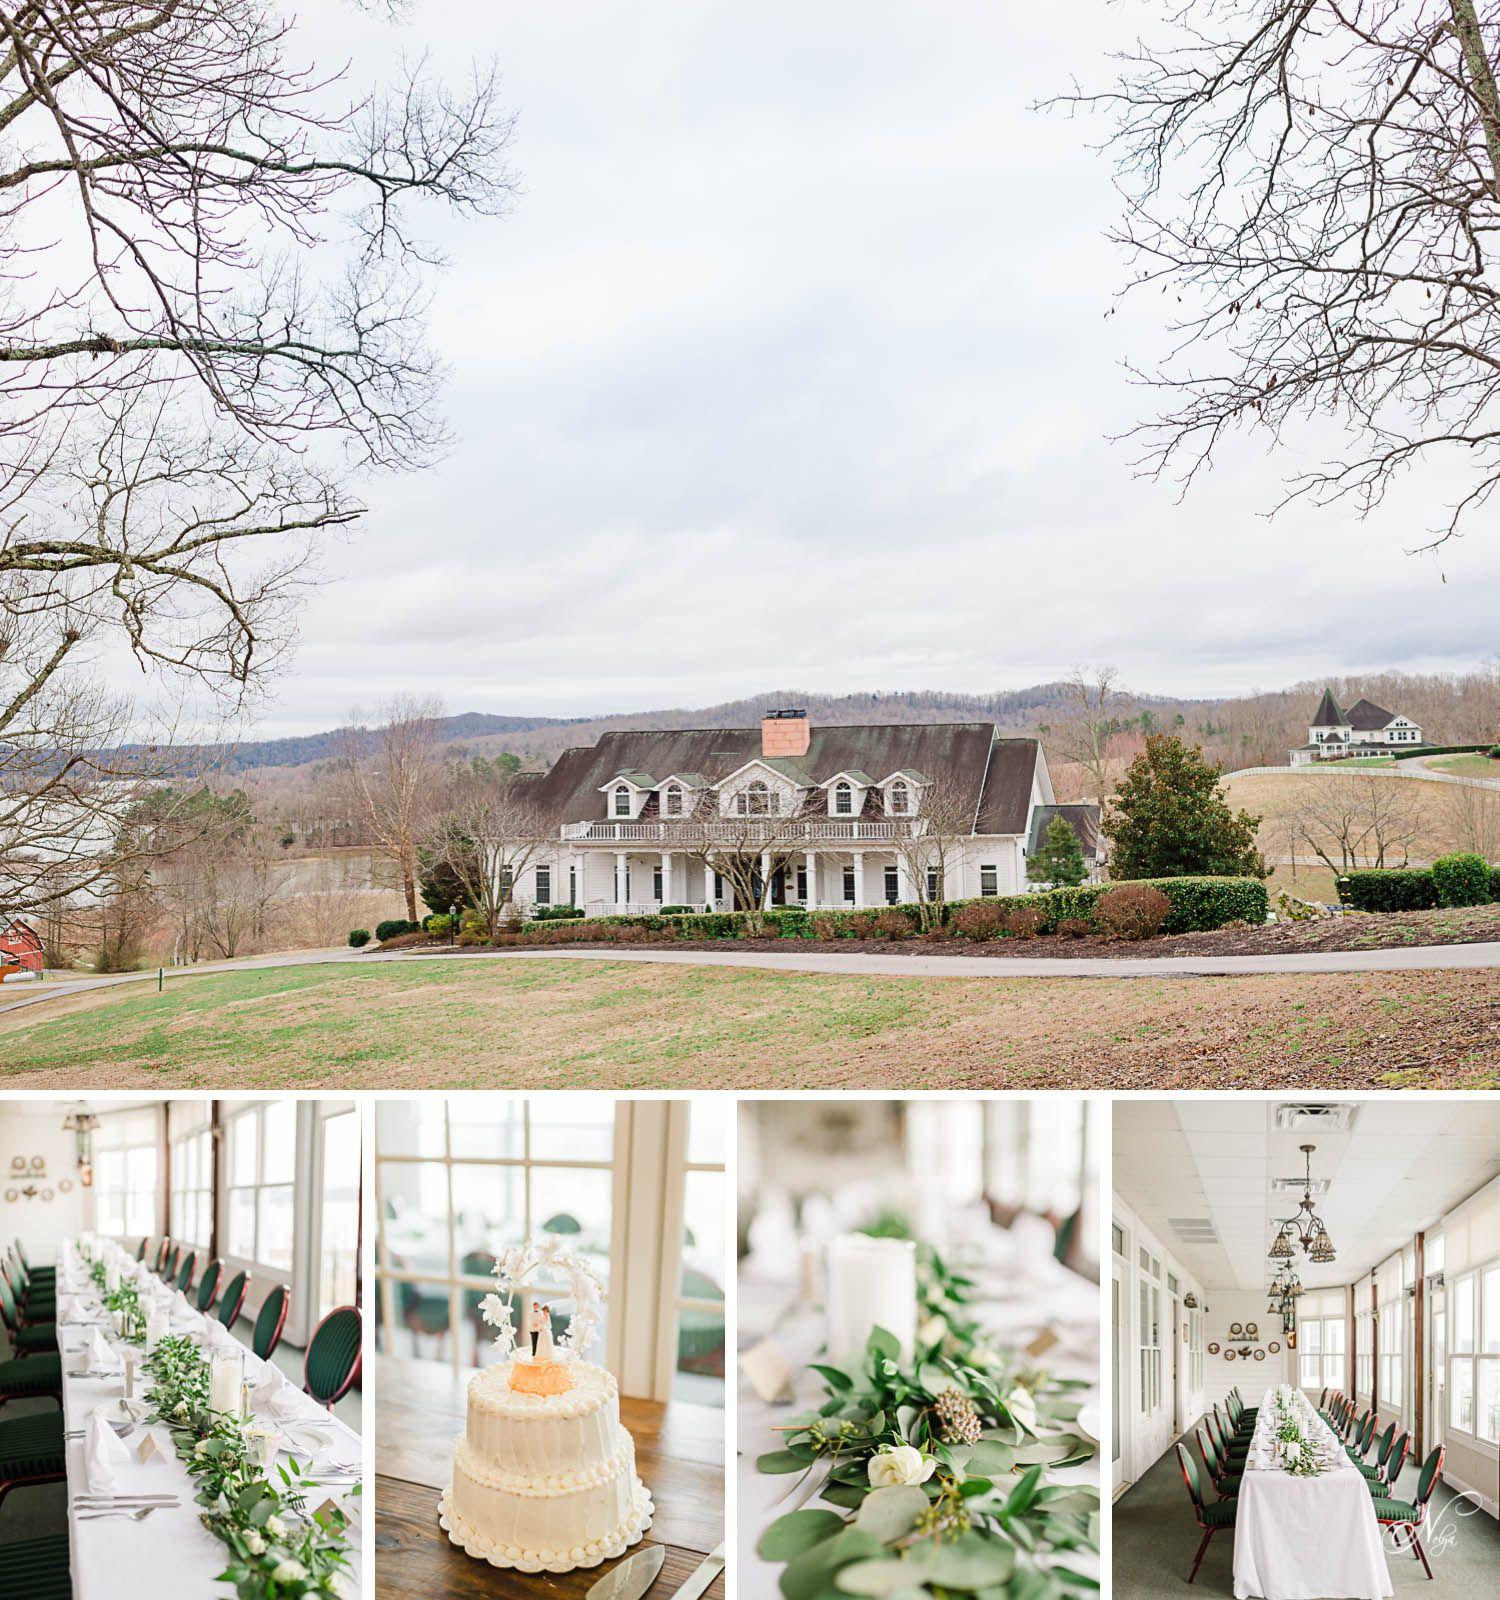 Whitestone Inn Winter Wedding Nelya Knoxville Wedding Photographer Gatlinburg Weddings Knoxville Wedding Photographer Winter Wedding